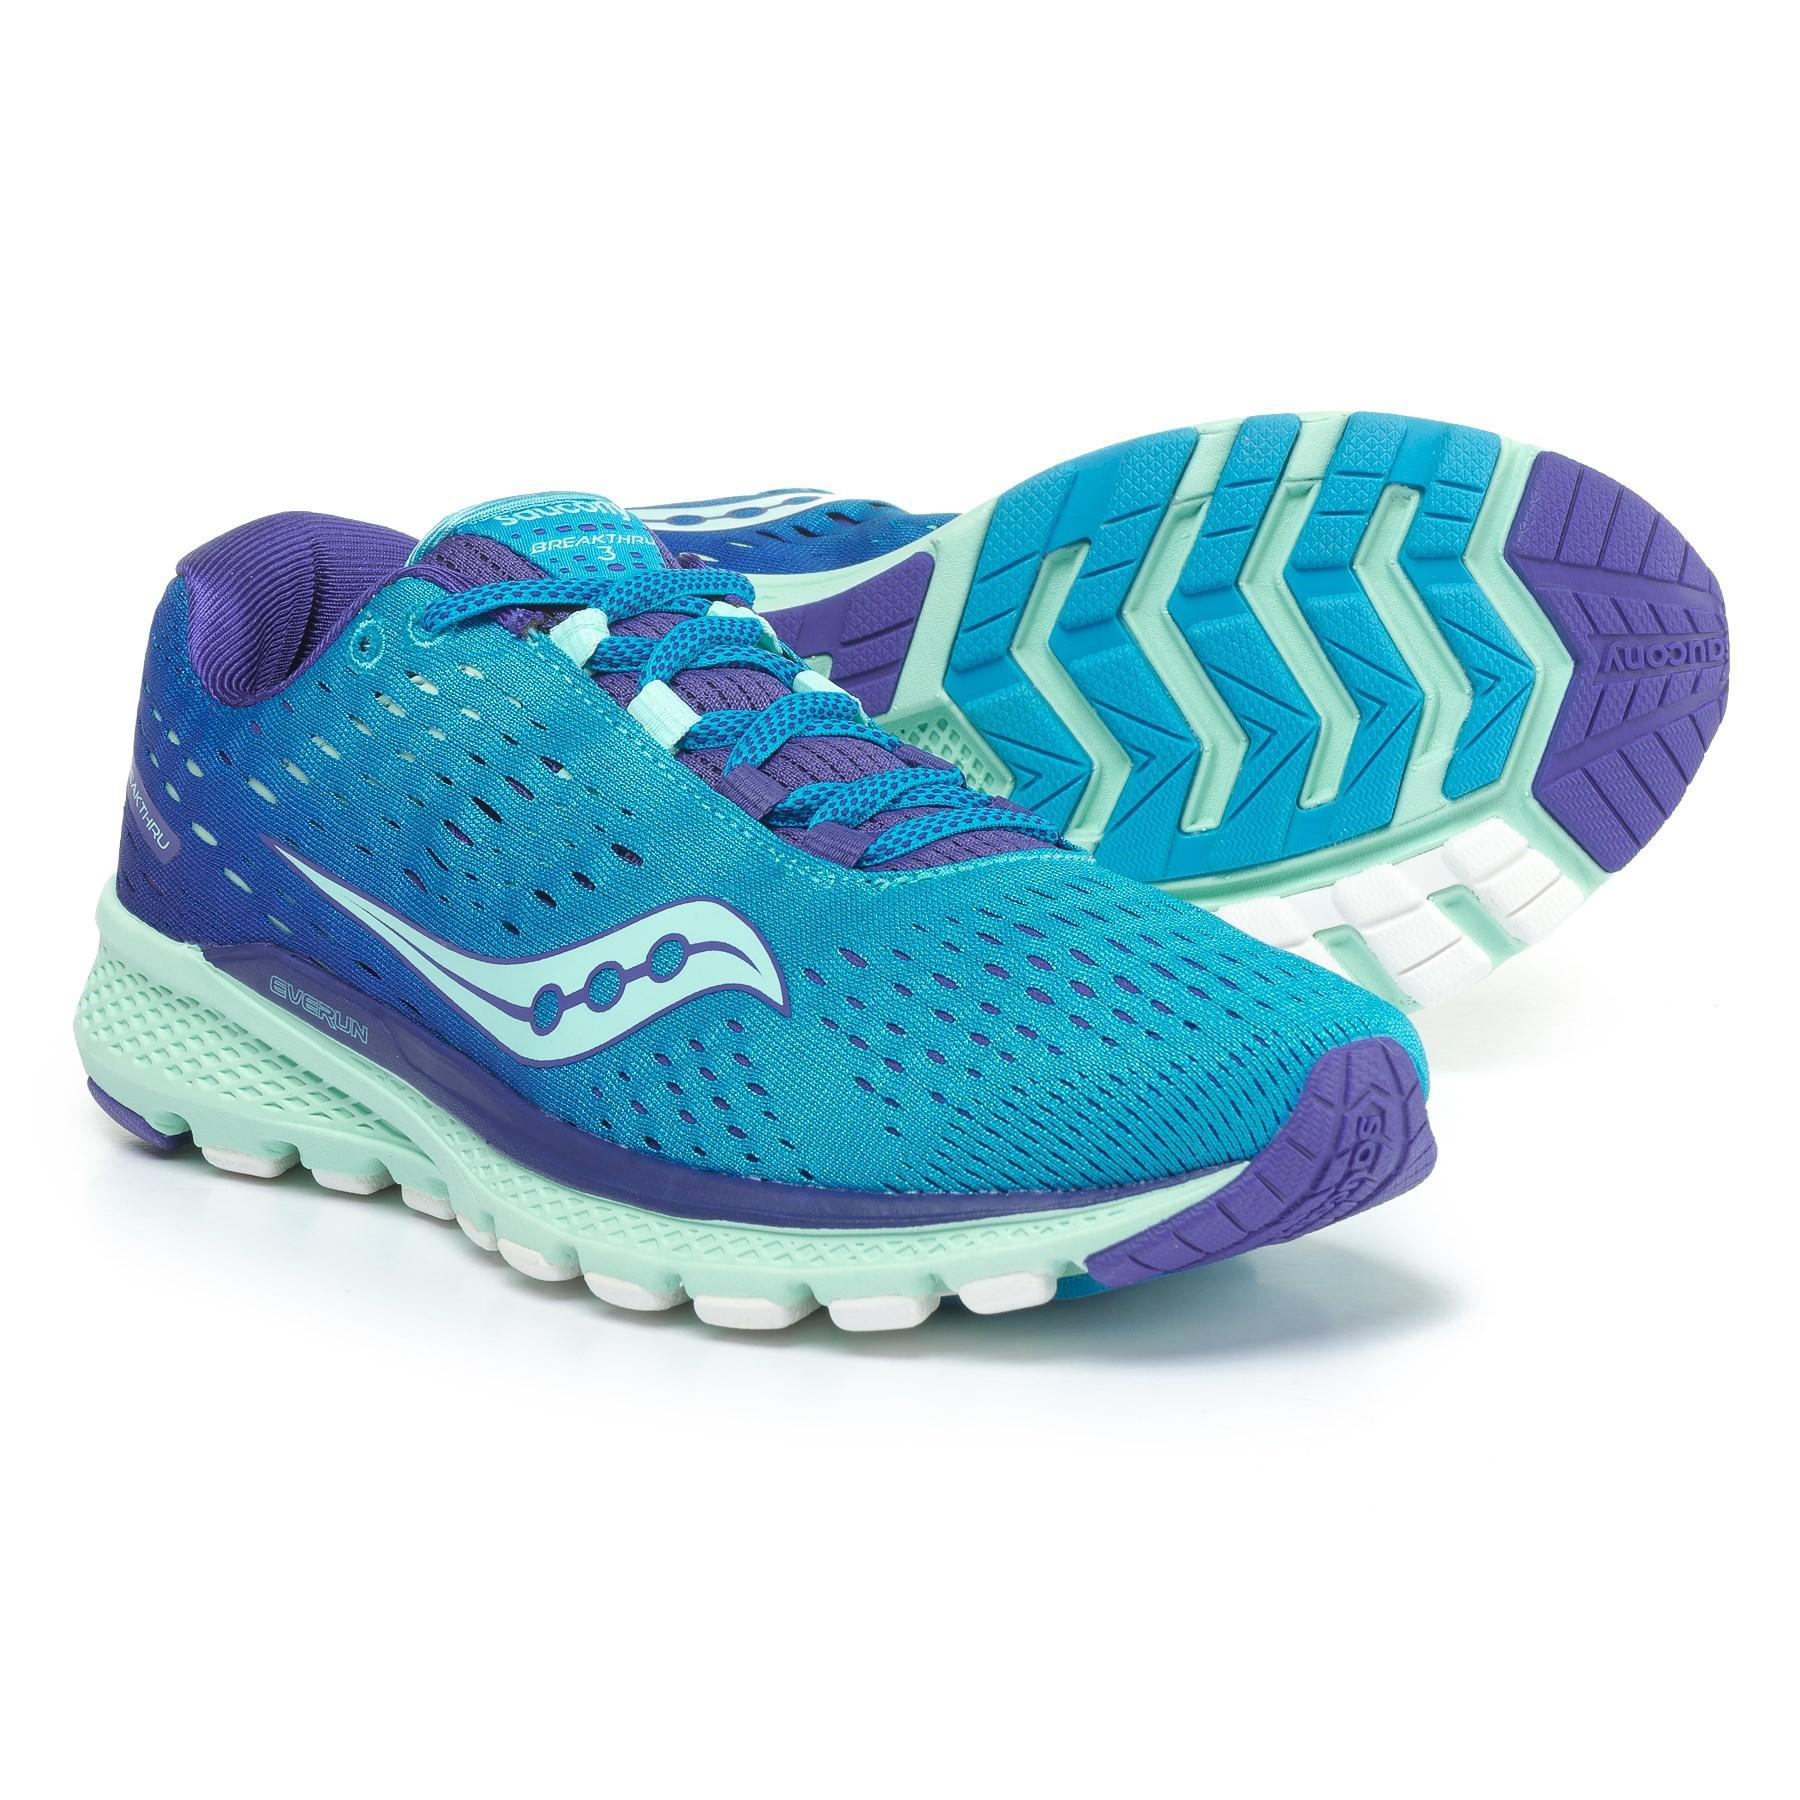 Saucony Blue Breakthru 3 Running Shoes (for Women)